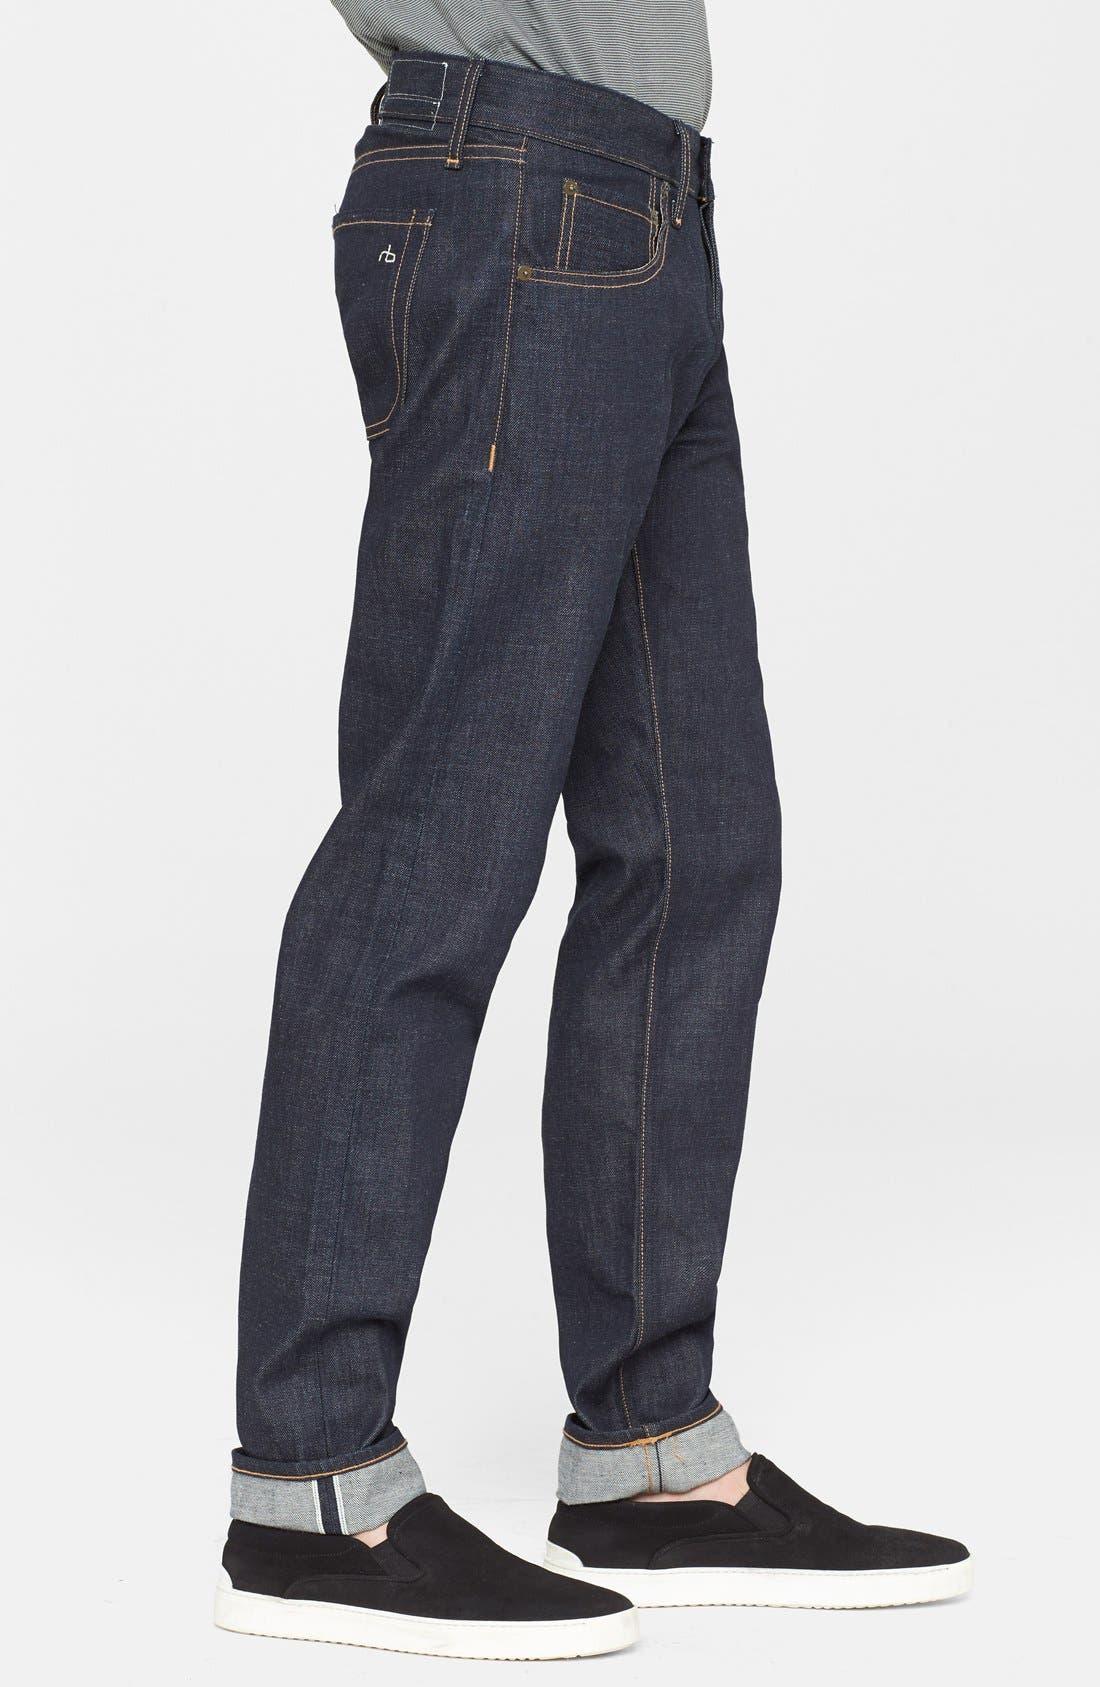 Alternate Image 3  - rag & bone Standard Issue Fit 2 Slim Fit Raw Selvedge Jeans (Indigo)